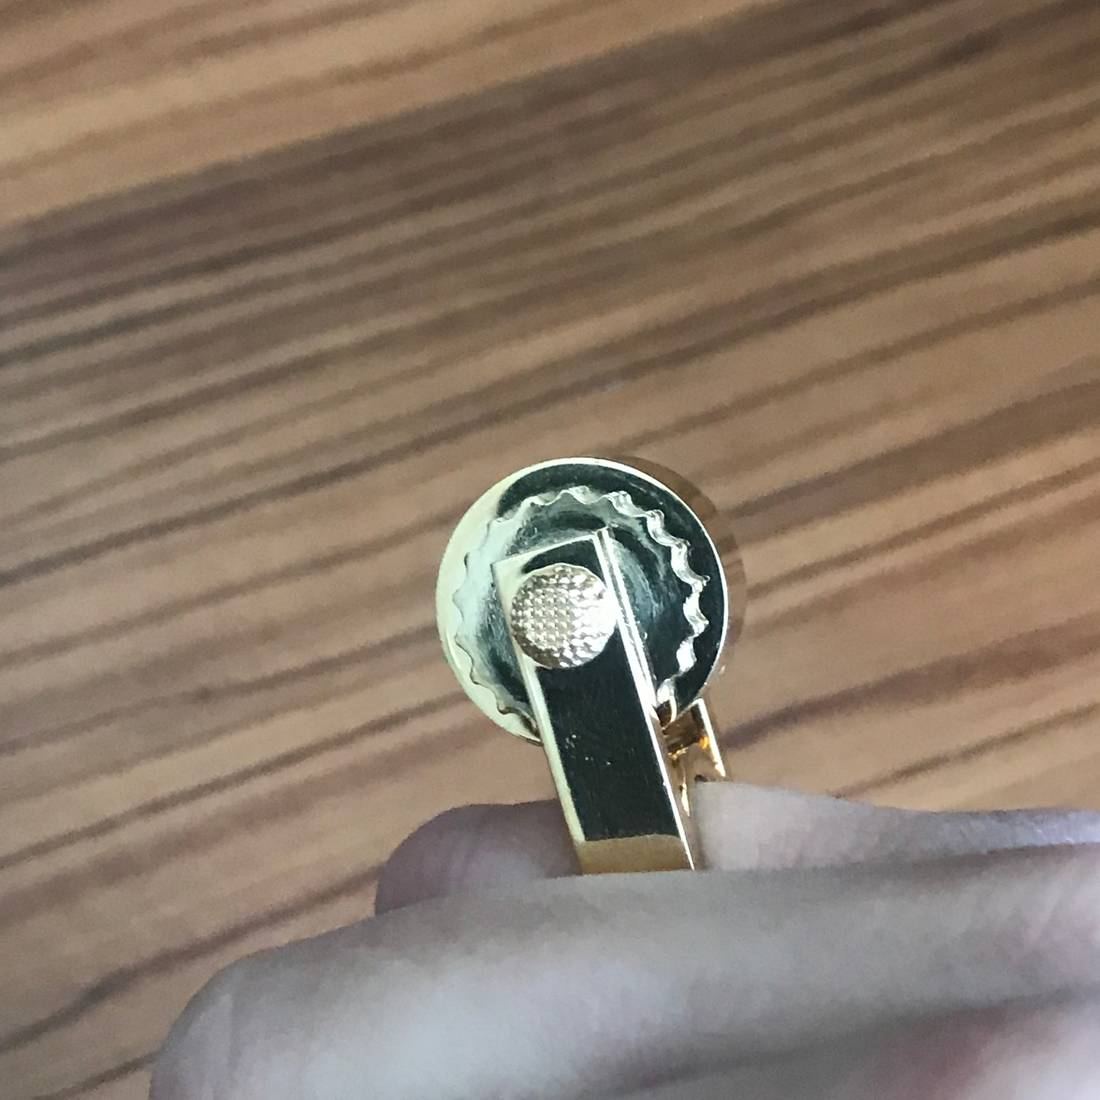 Spinner Bintang Silver Metal Daftar Harga Terbaru Dan Terupdate Fidget Full Segi Tiga Sj0048 Balenciaga 355 Superb Palladium Ring Gold 52 Size One